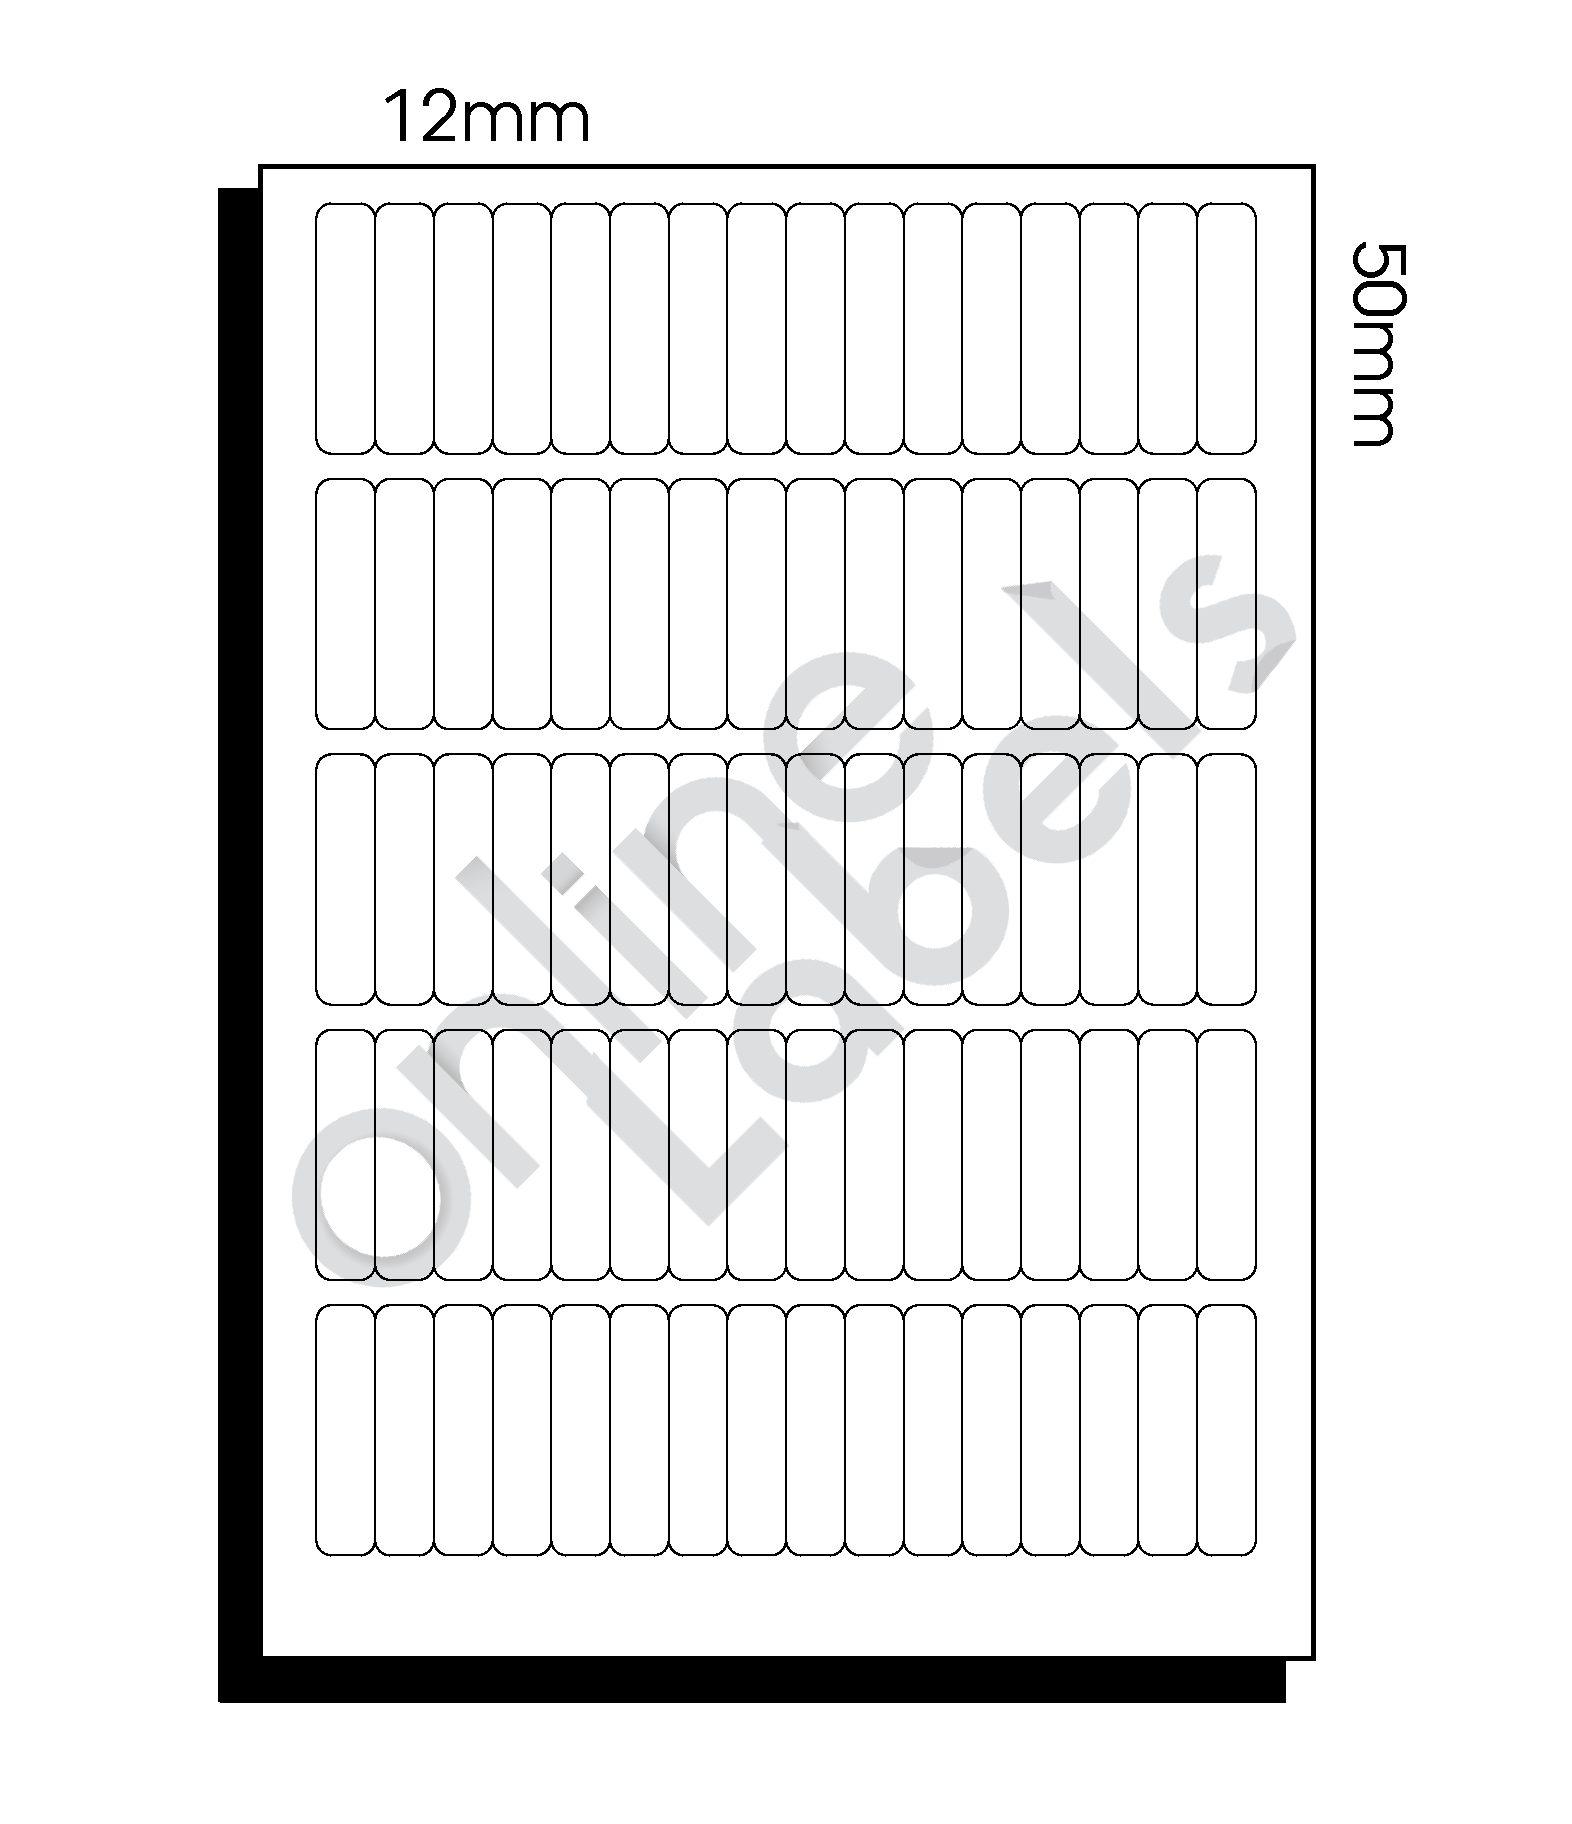 12mm x 50mm 80 labels per sheet online labels